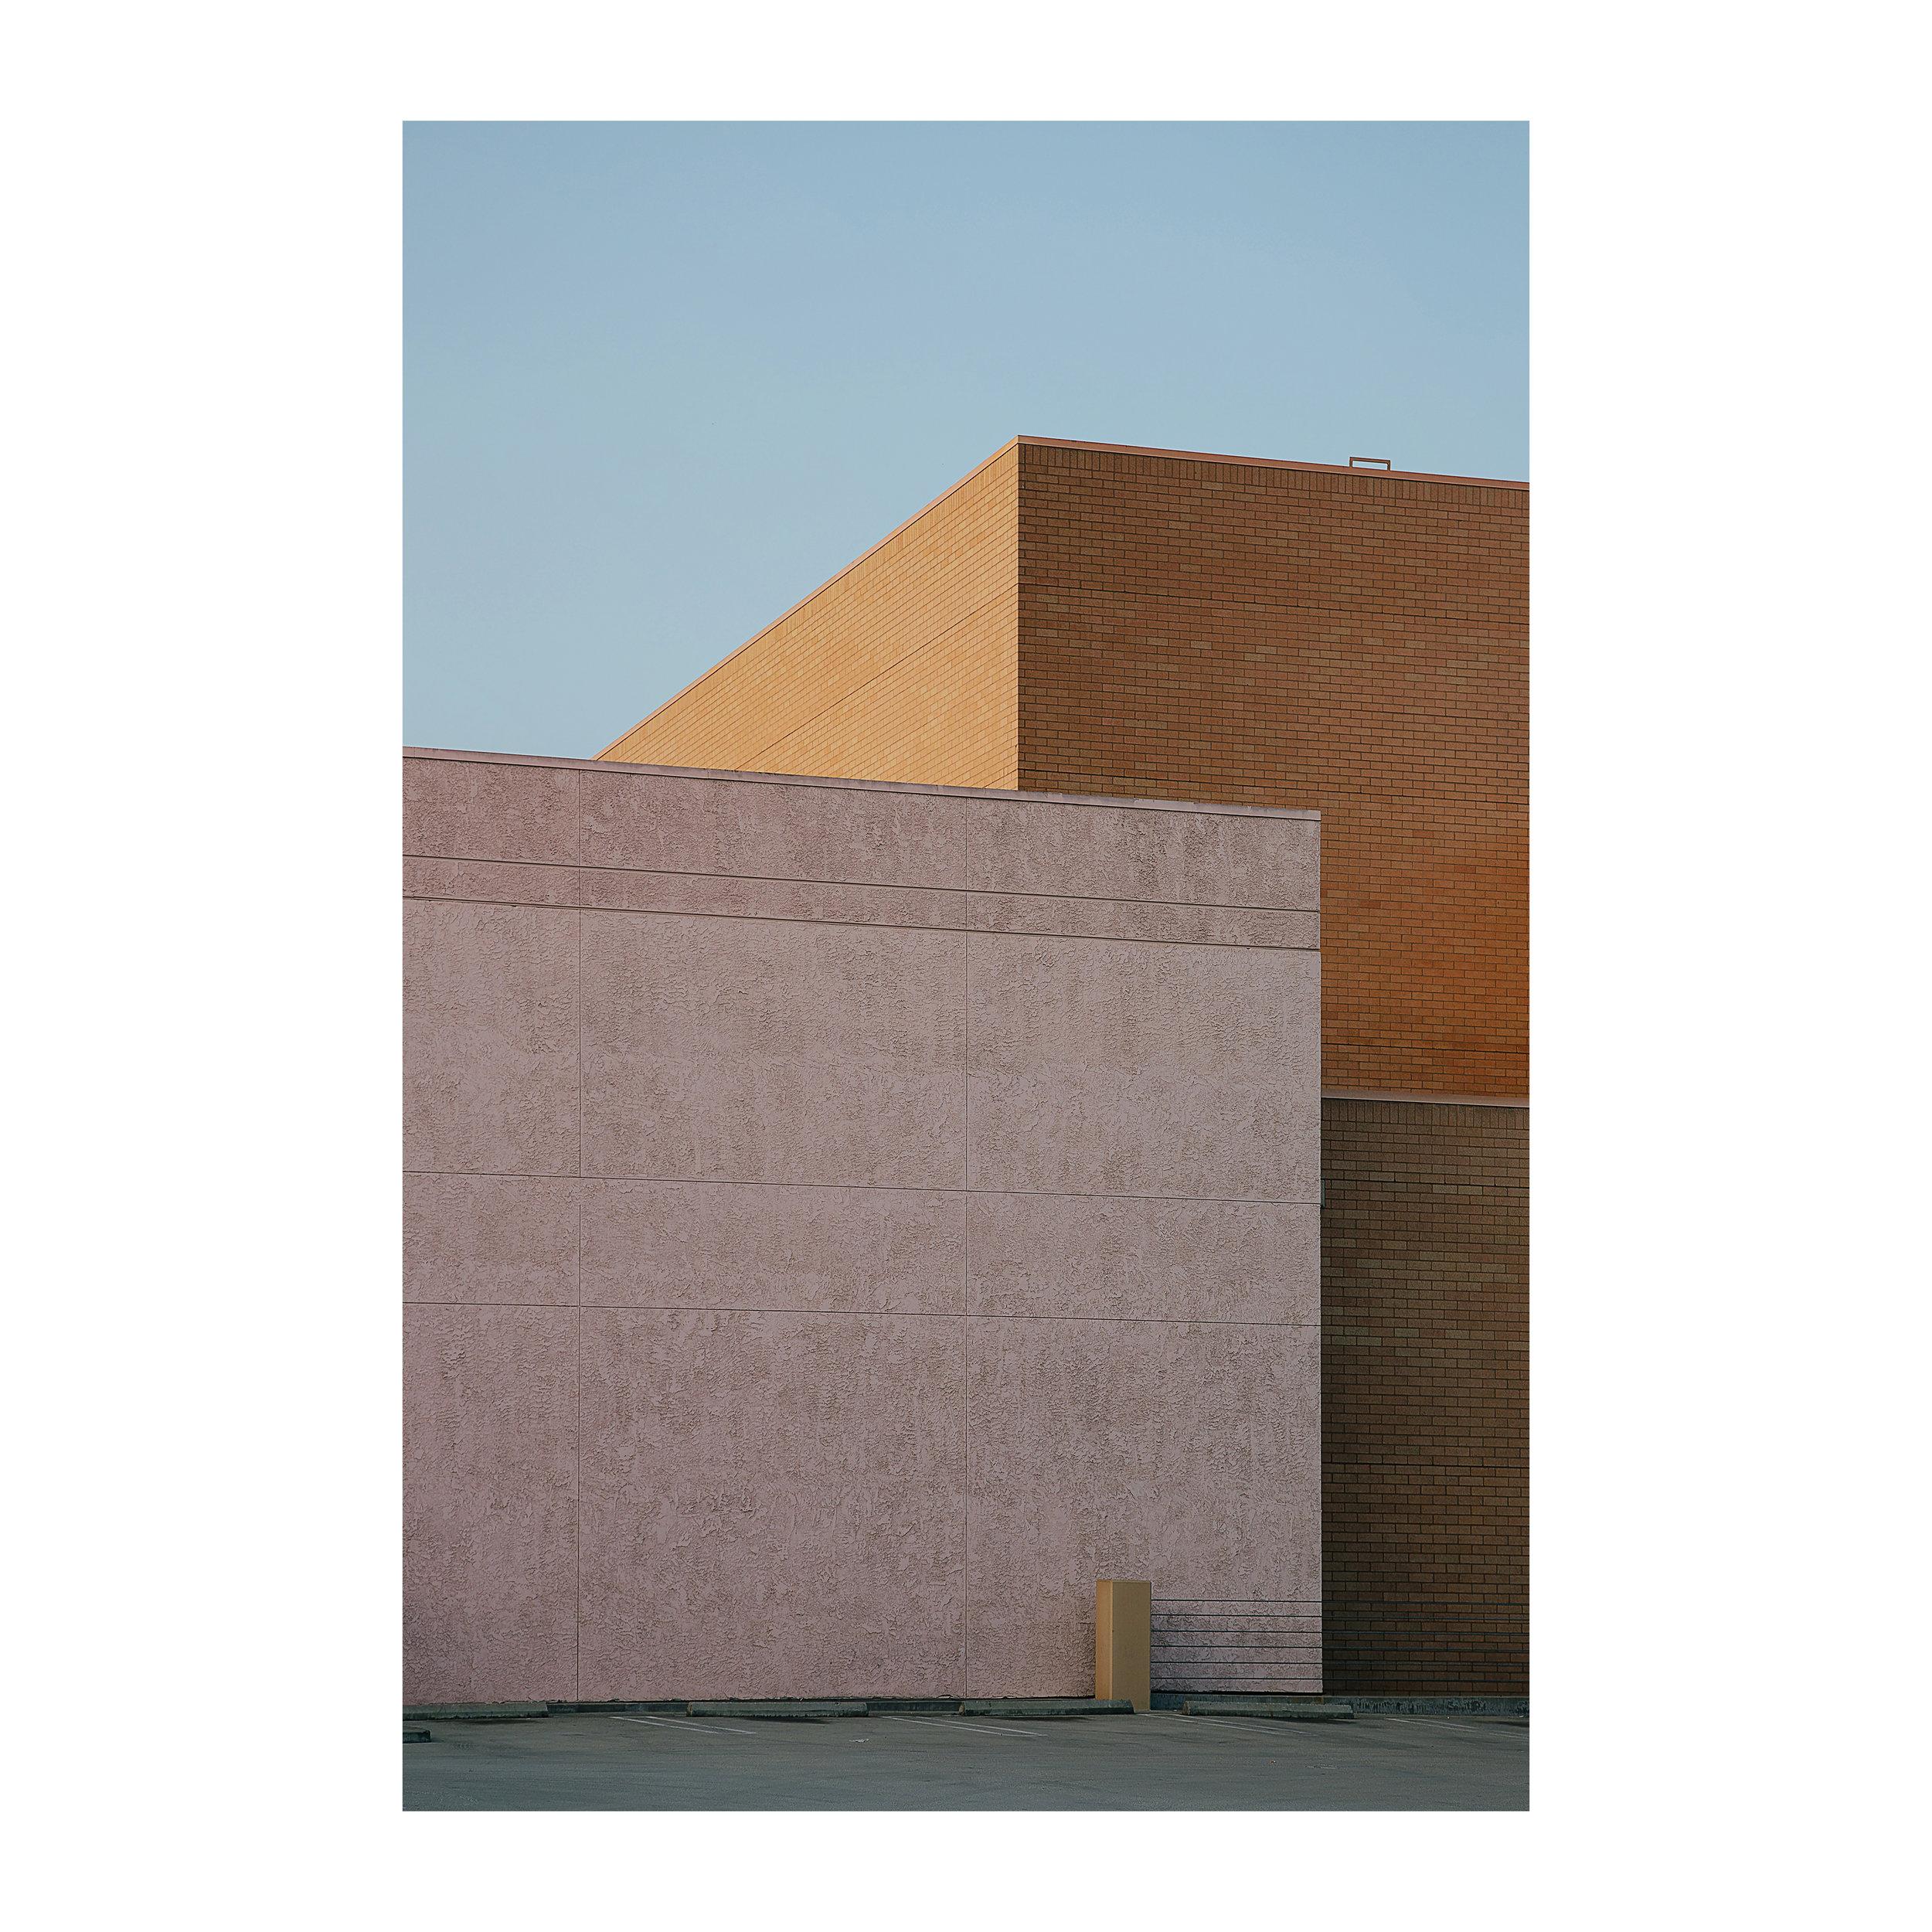 "Urban Blocks; Orange County, California  Lightjet Kodak Endura C-Print, 30.0"" x 20.0""  Signed, 2017  Edition of Five + 1 Artist Proof"